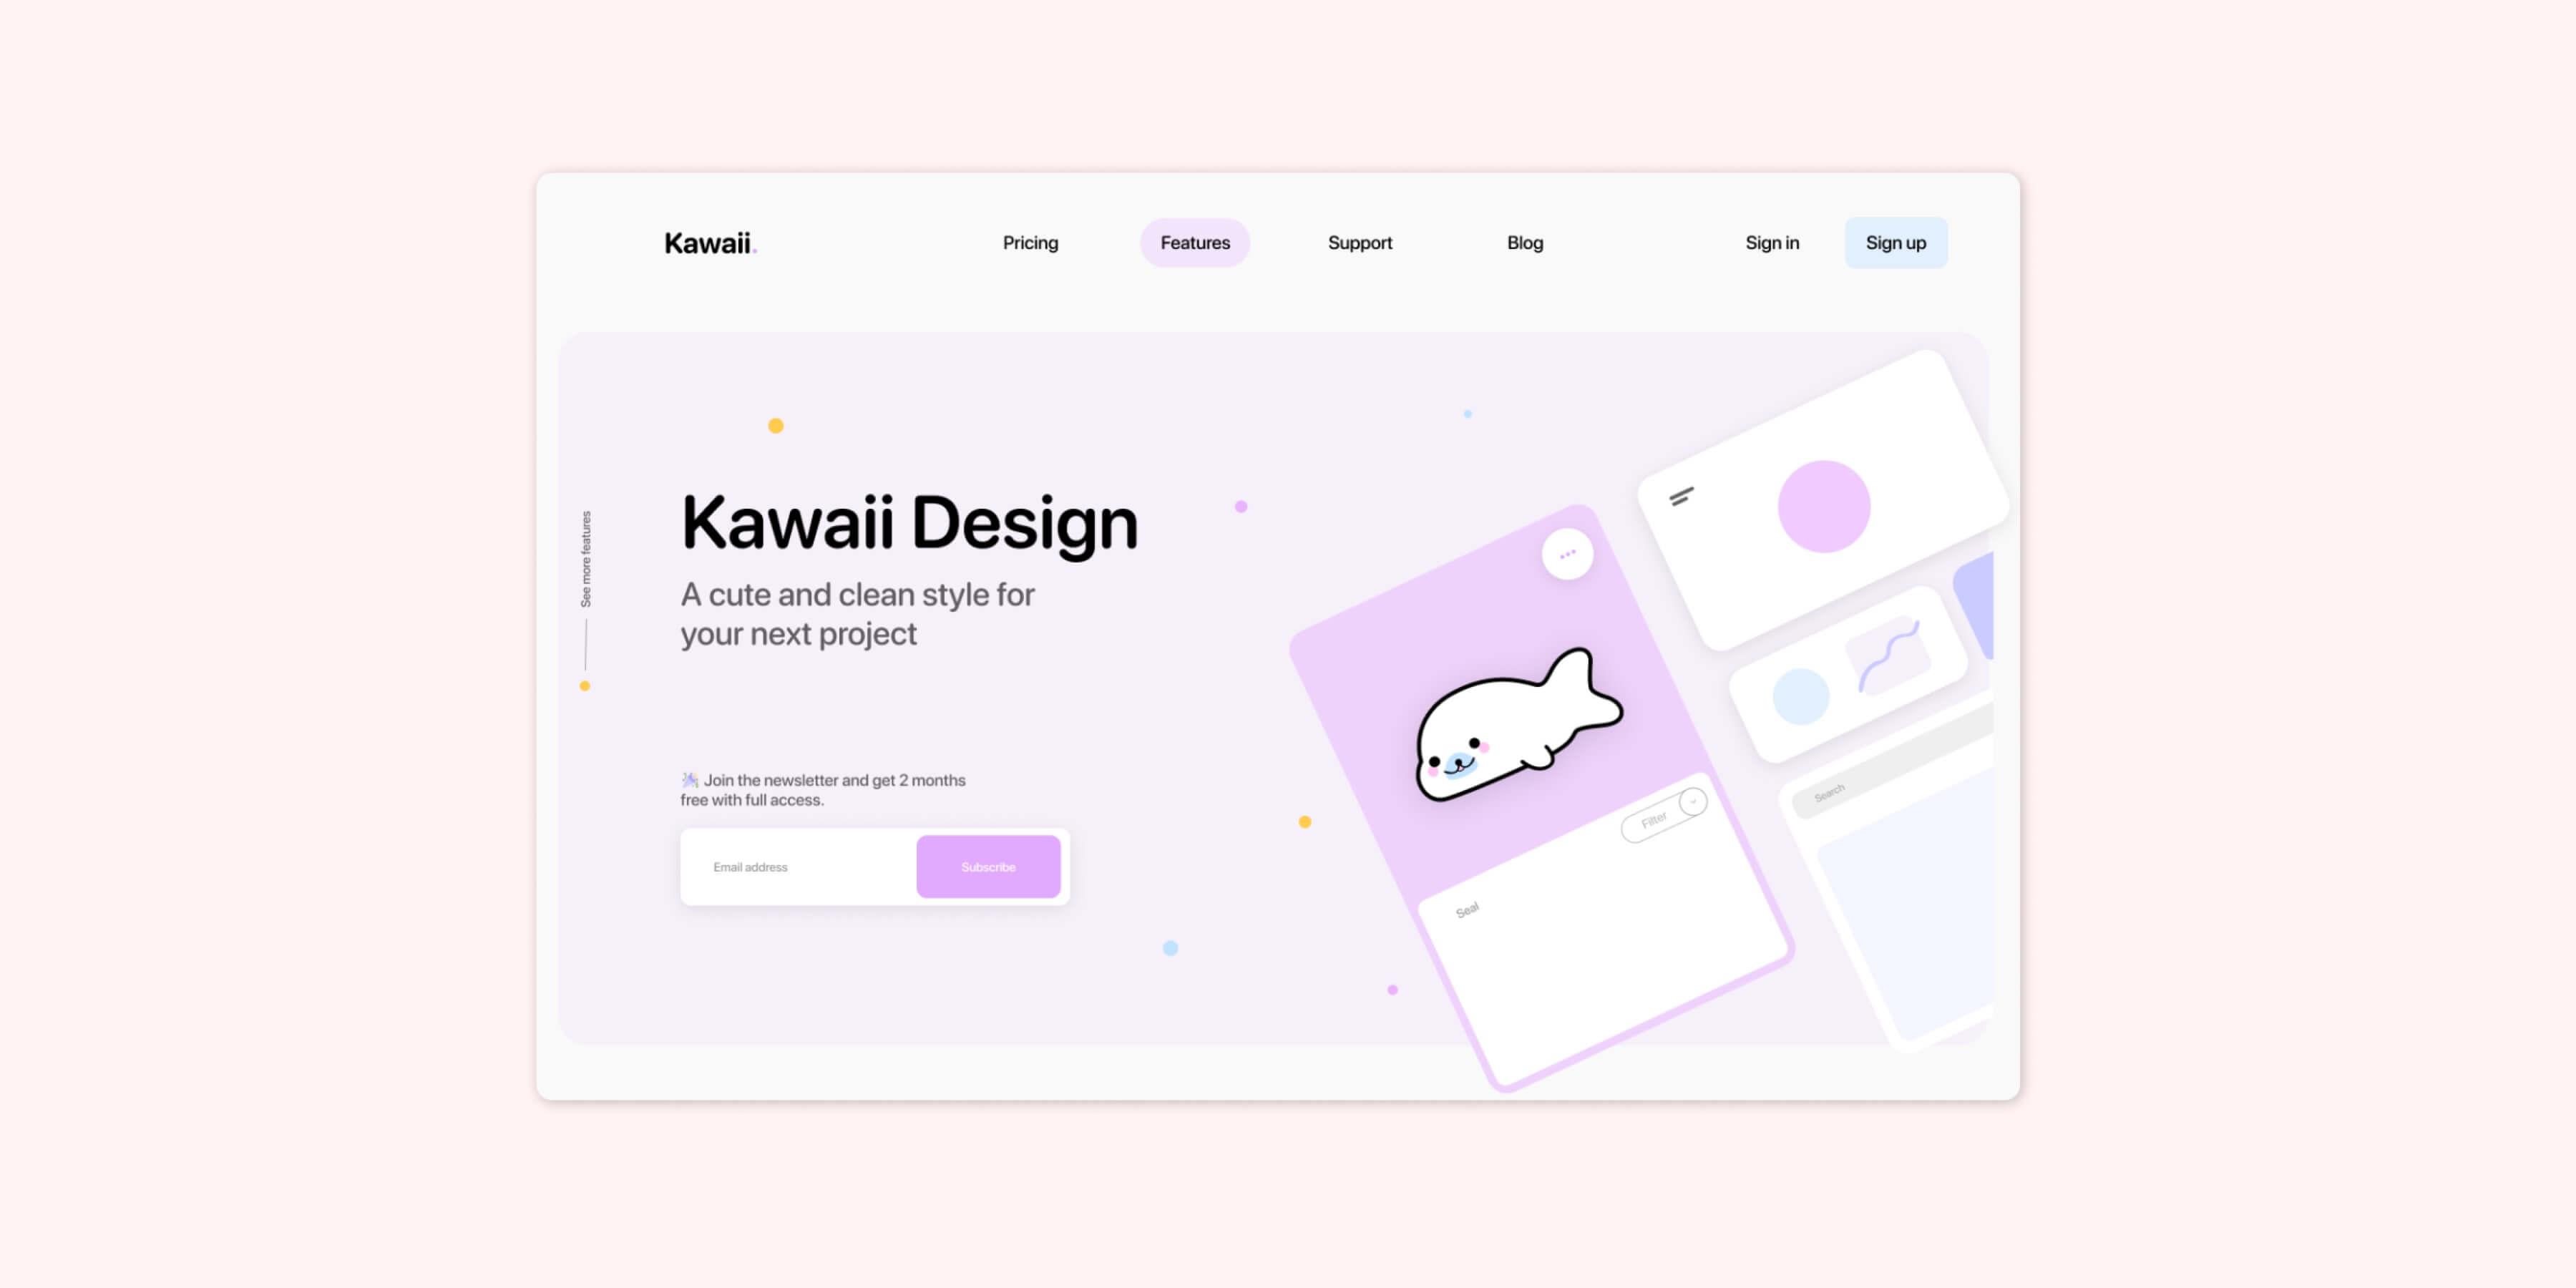 Die Kawaiisierung des UX Designs